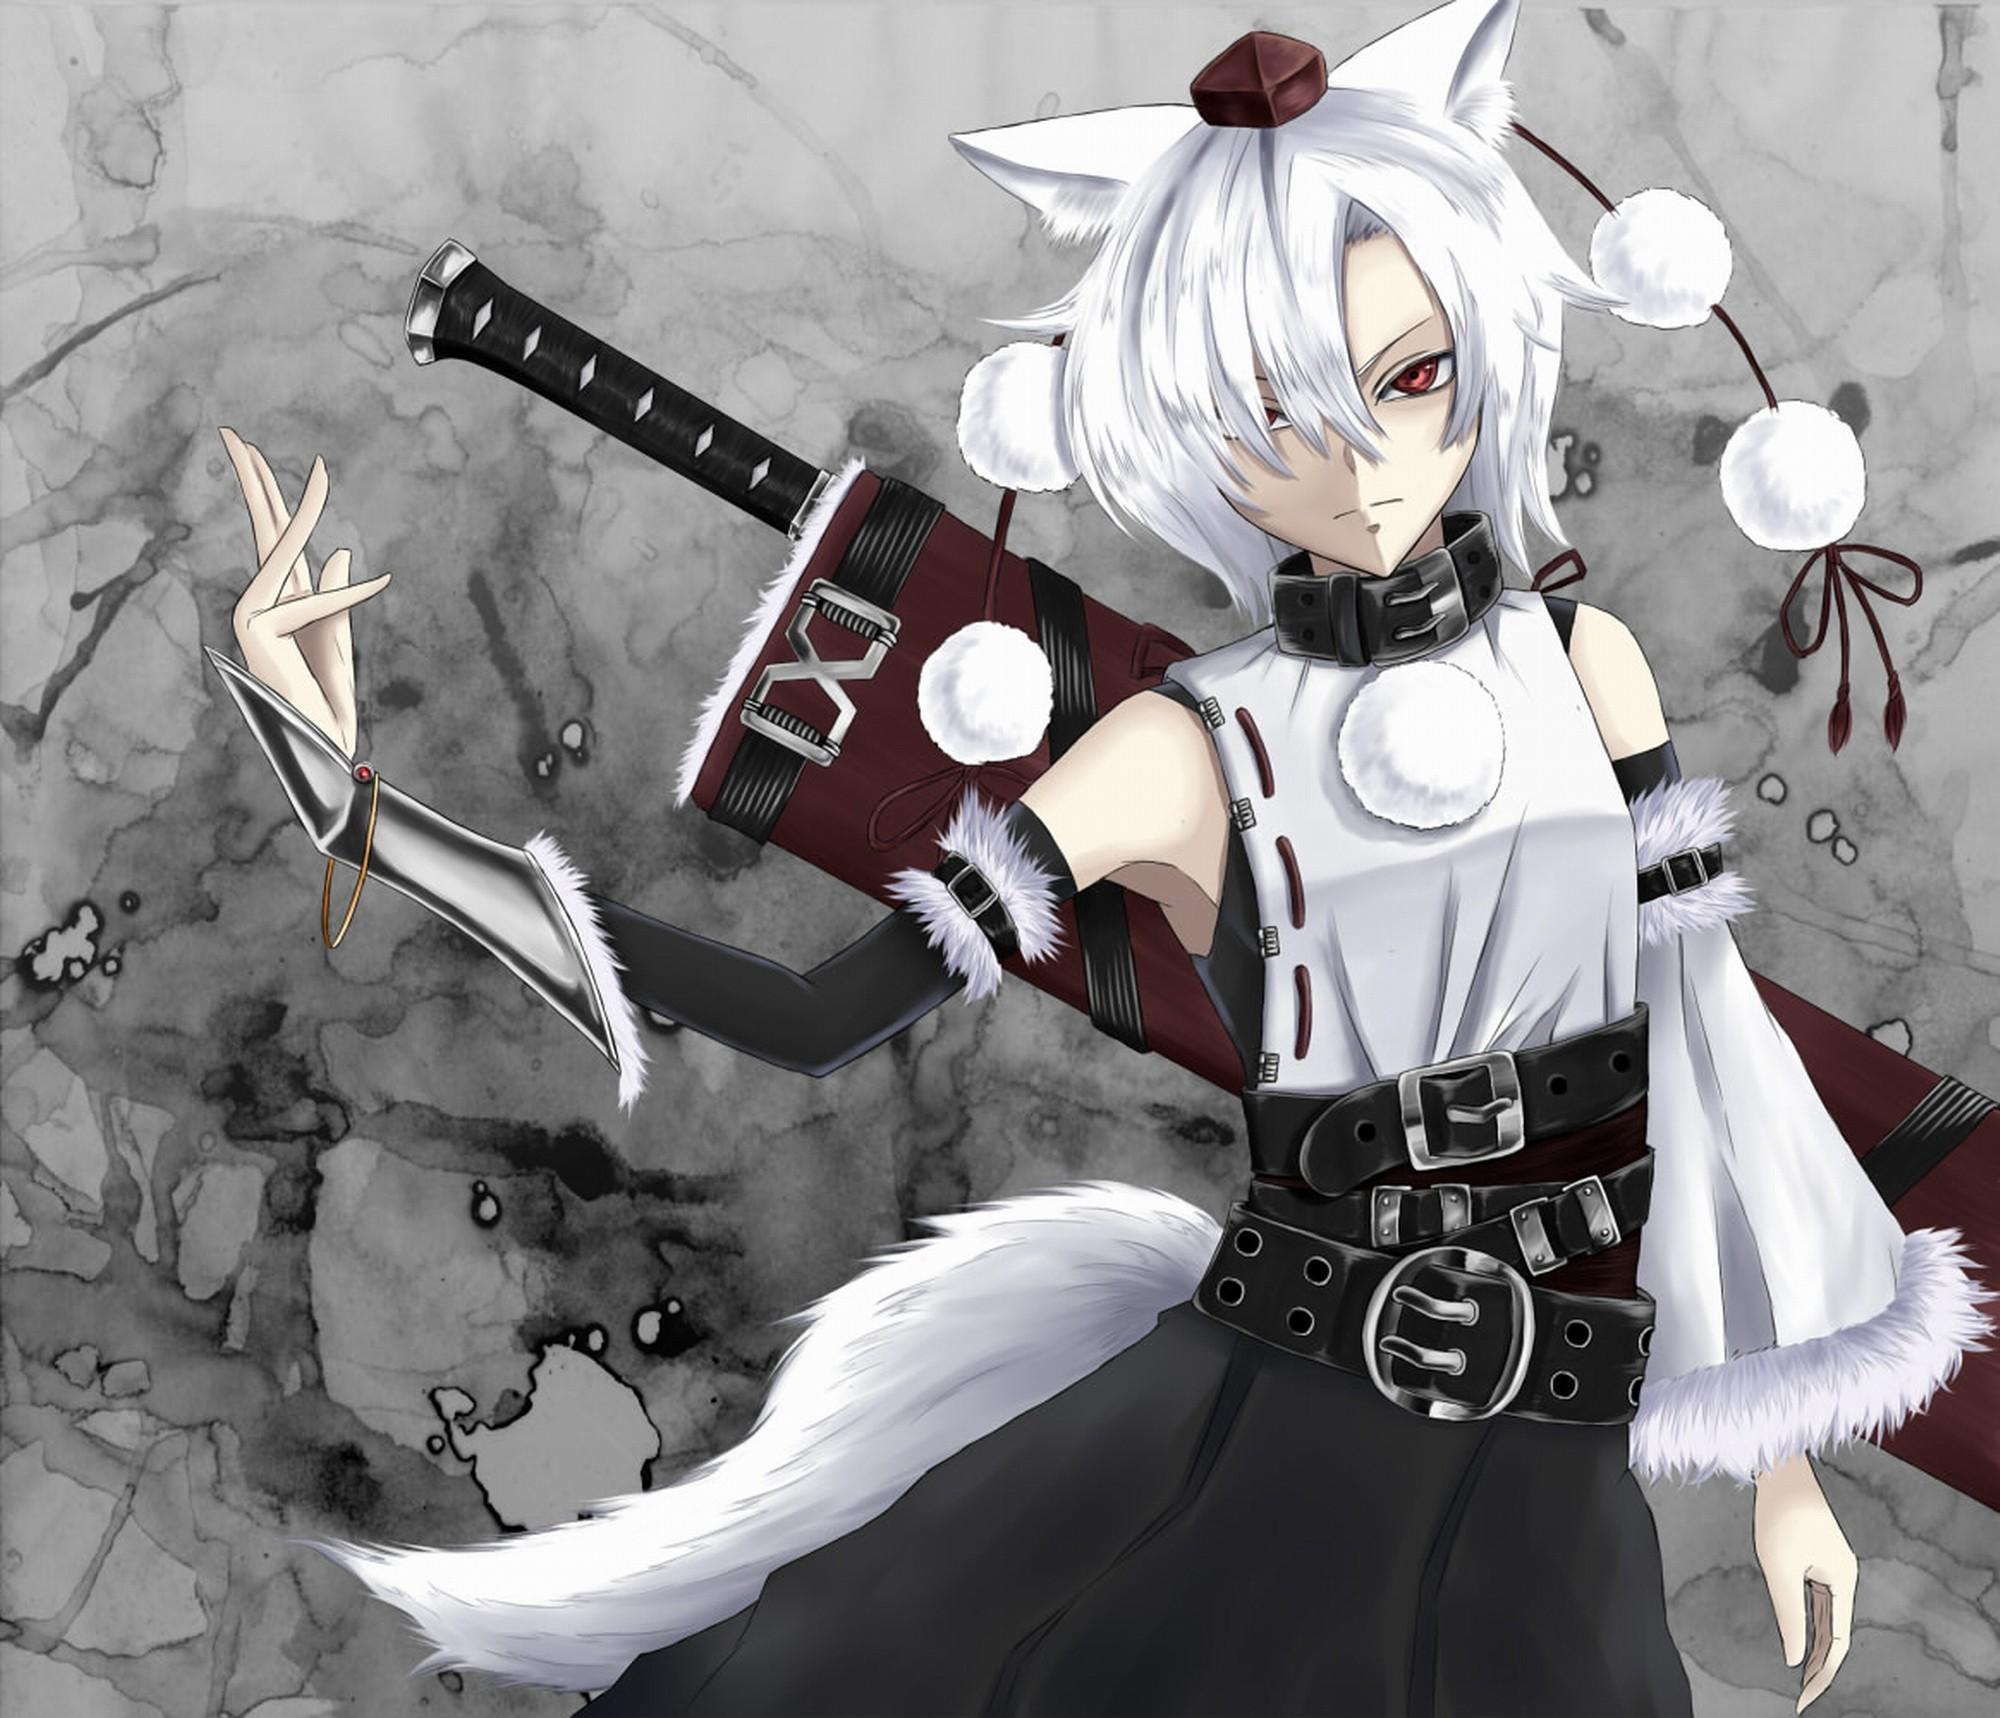 Badass Inubashiri Momiji Hats Girls With Swords Wolf Girl 2000x1718